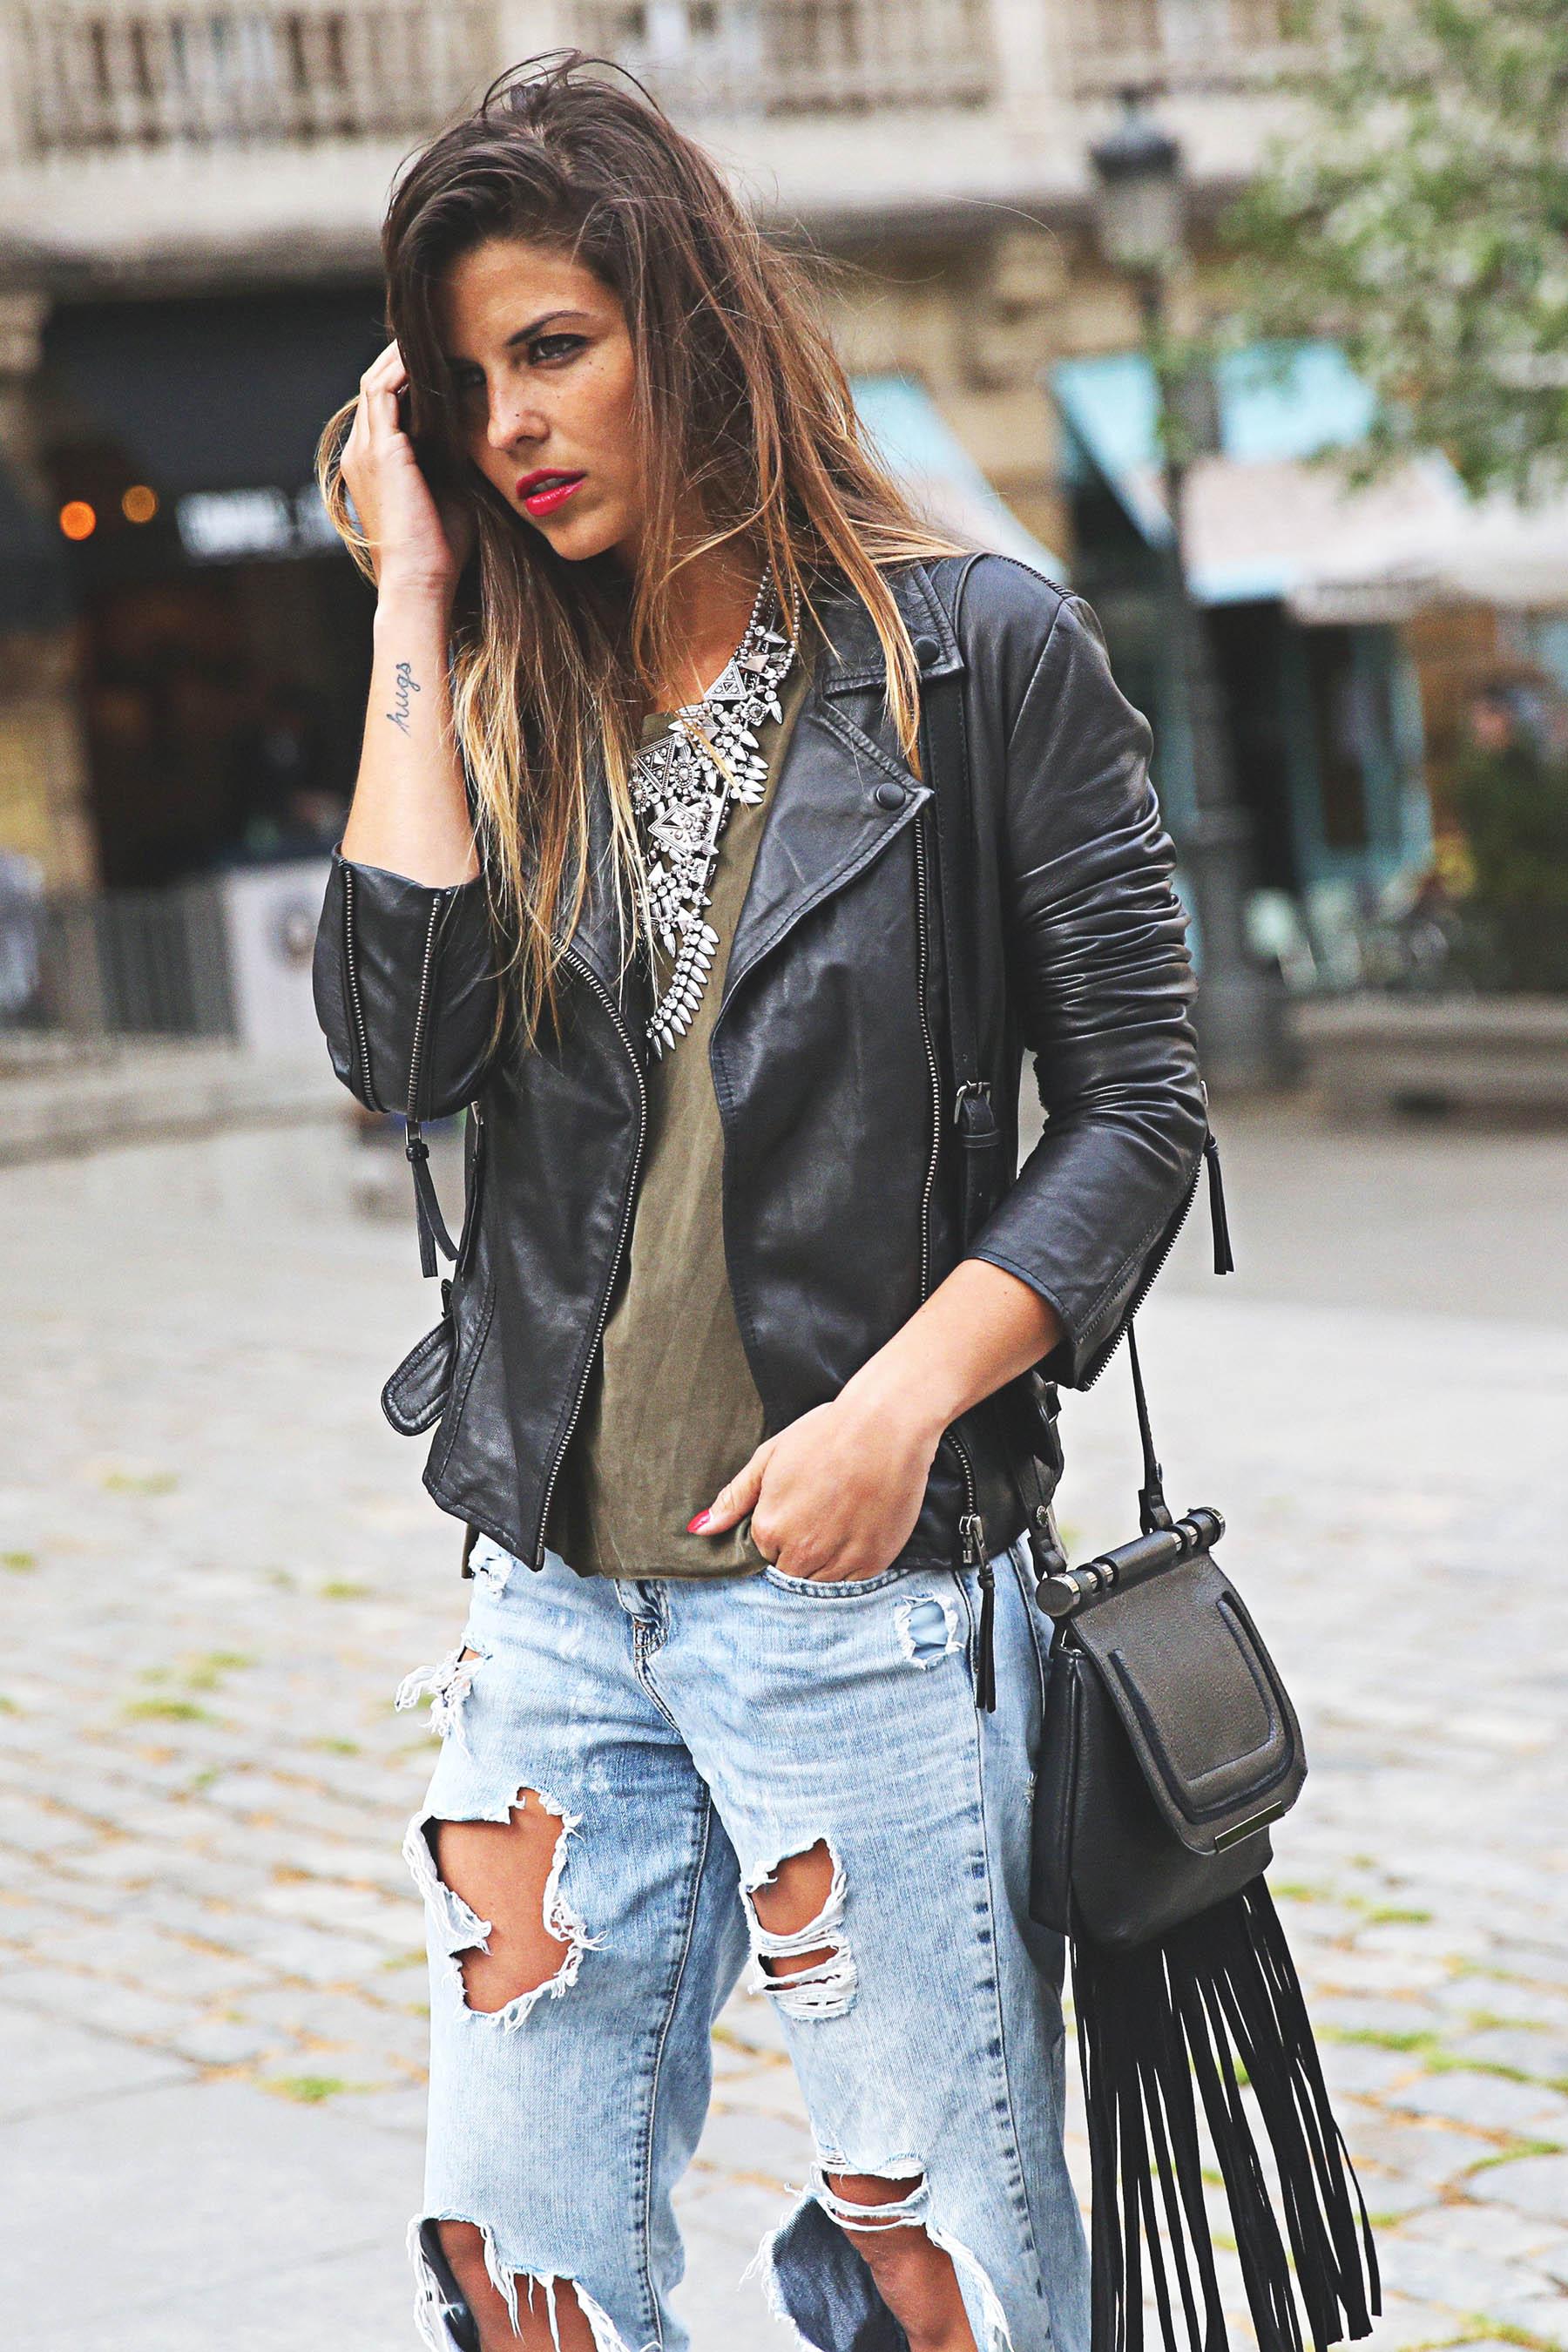 trendy-taste-look-outfit-street-style-ootd-blog-blogger-fashion-spain-moda-españa-boyfriend-vaqueros-jeans-steve-madden-sandalias-verano-primavera-leather-jacket-chaqueta-cuero-khaki-caqui-ripped-rotos-7